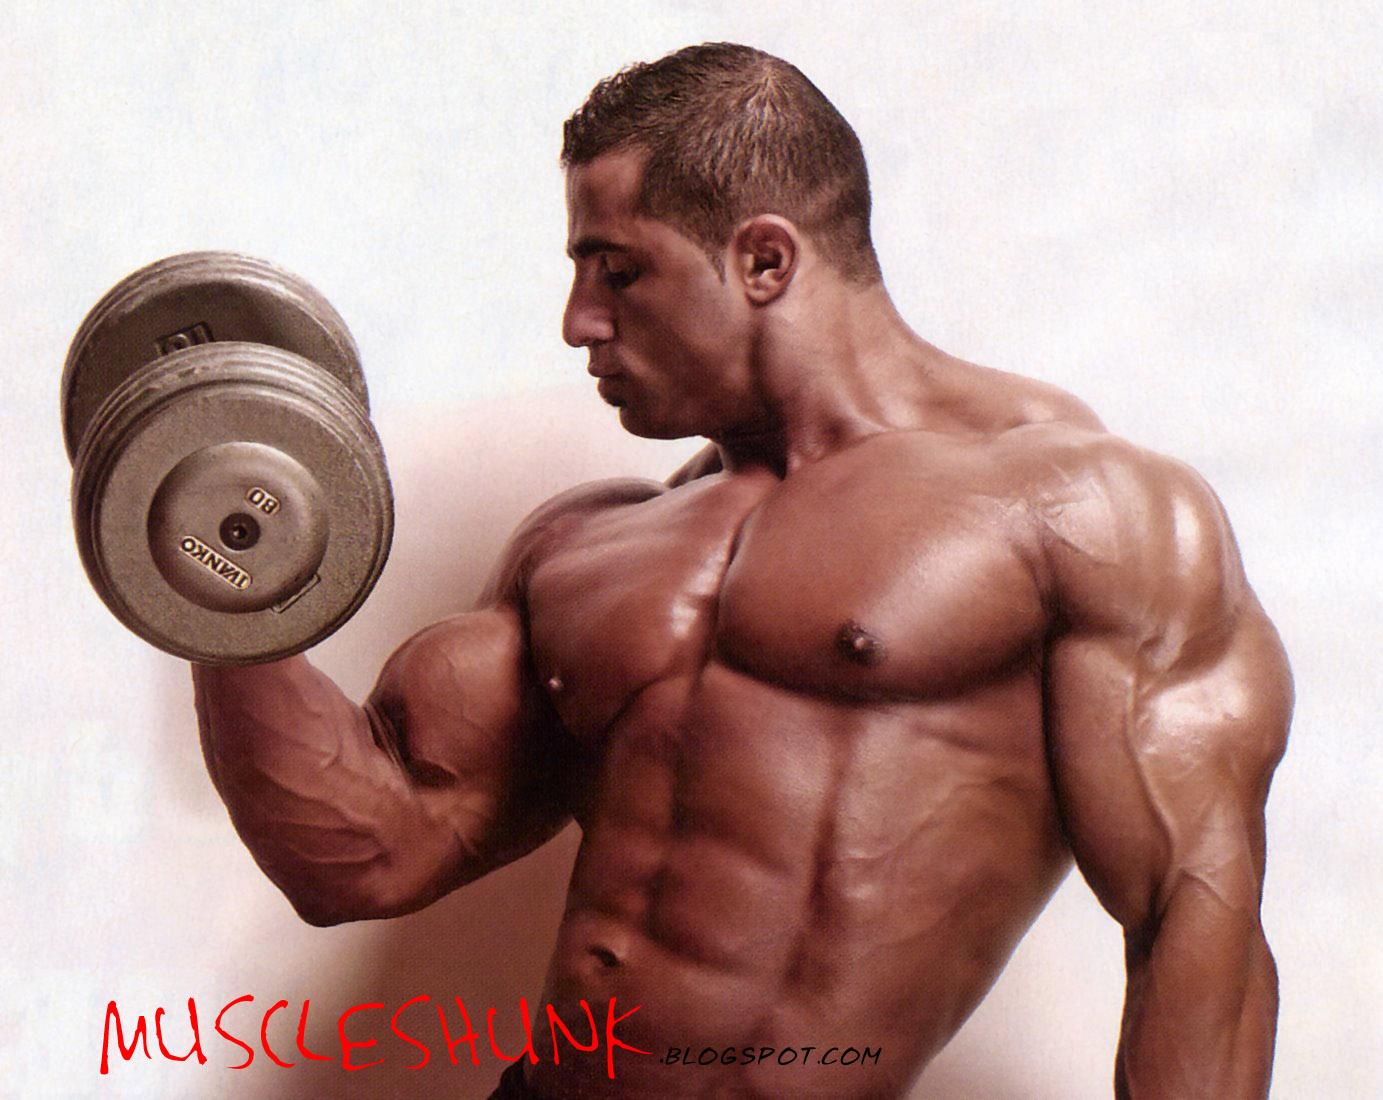 http://1.bp.blogspot.com/-7WaGXQuBvvQ/TzZwZBxZGLI/AAAAAAAAB3U/7sAEfqCvr8s/s1600/Fouad+Abiad+(3).jpg